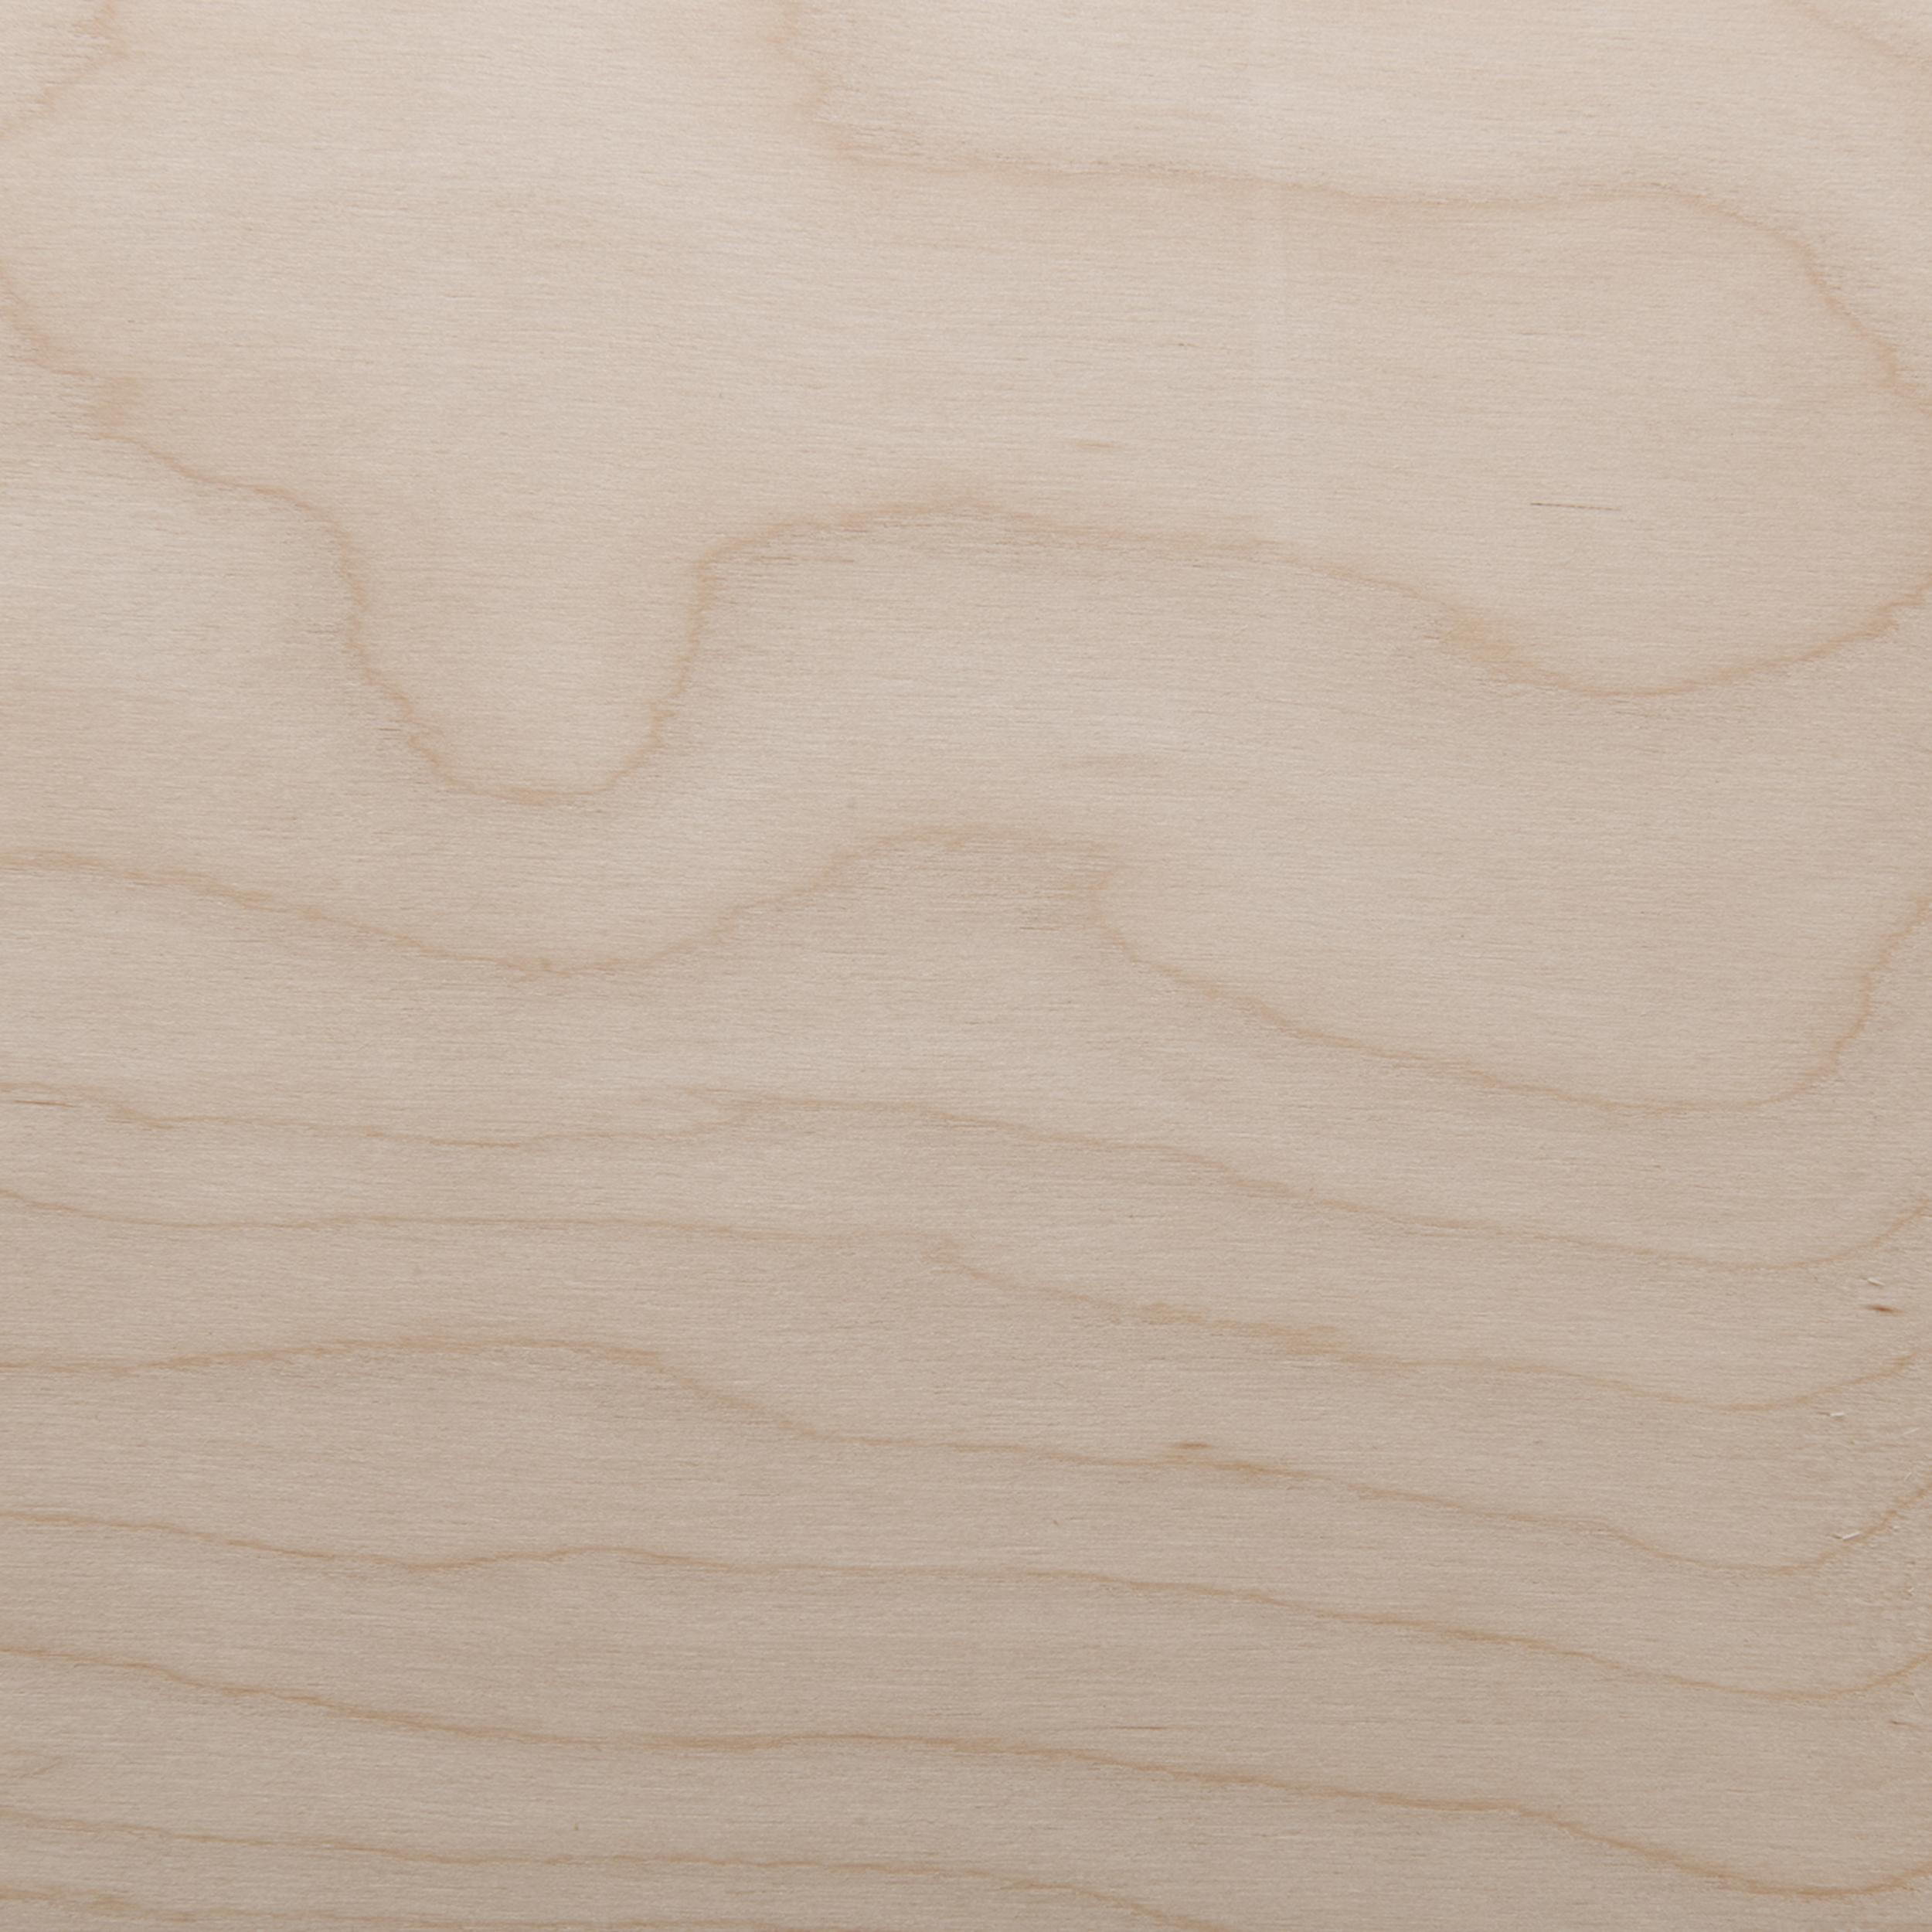 White Birch Veneer Sheet Rotary Cut Whole Piece 4' x 8' 2-Ply Wood on Wood